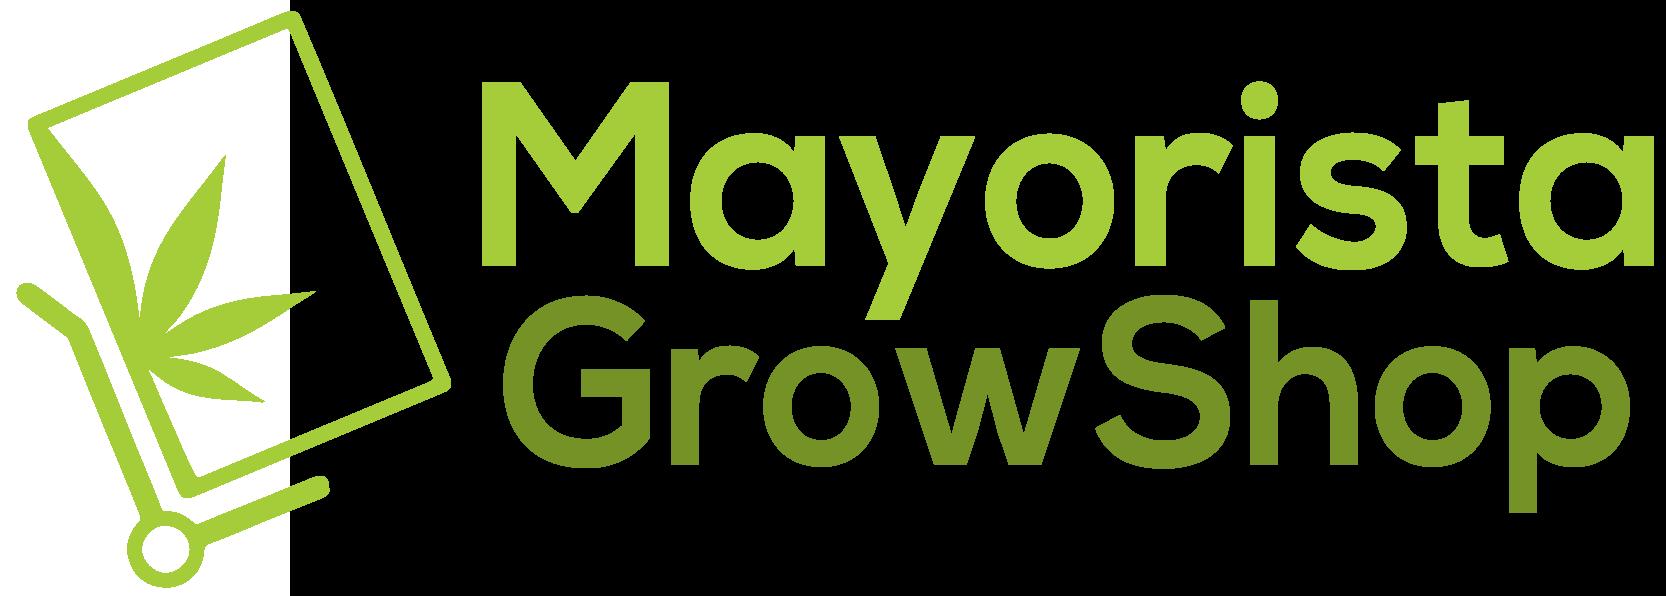 Mayorista Grow Shop